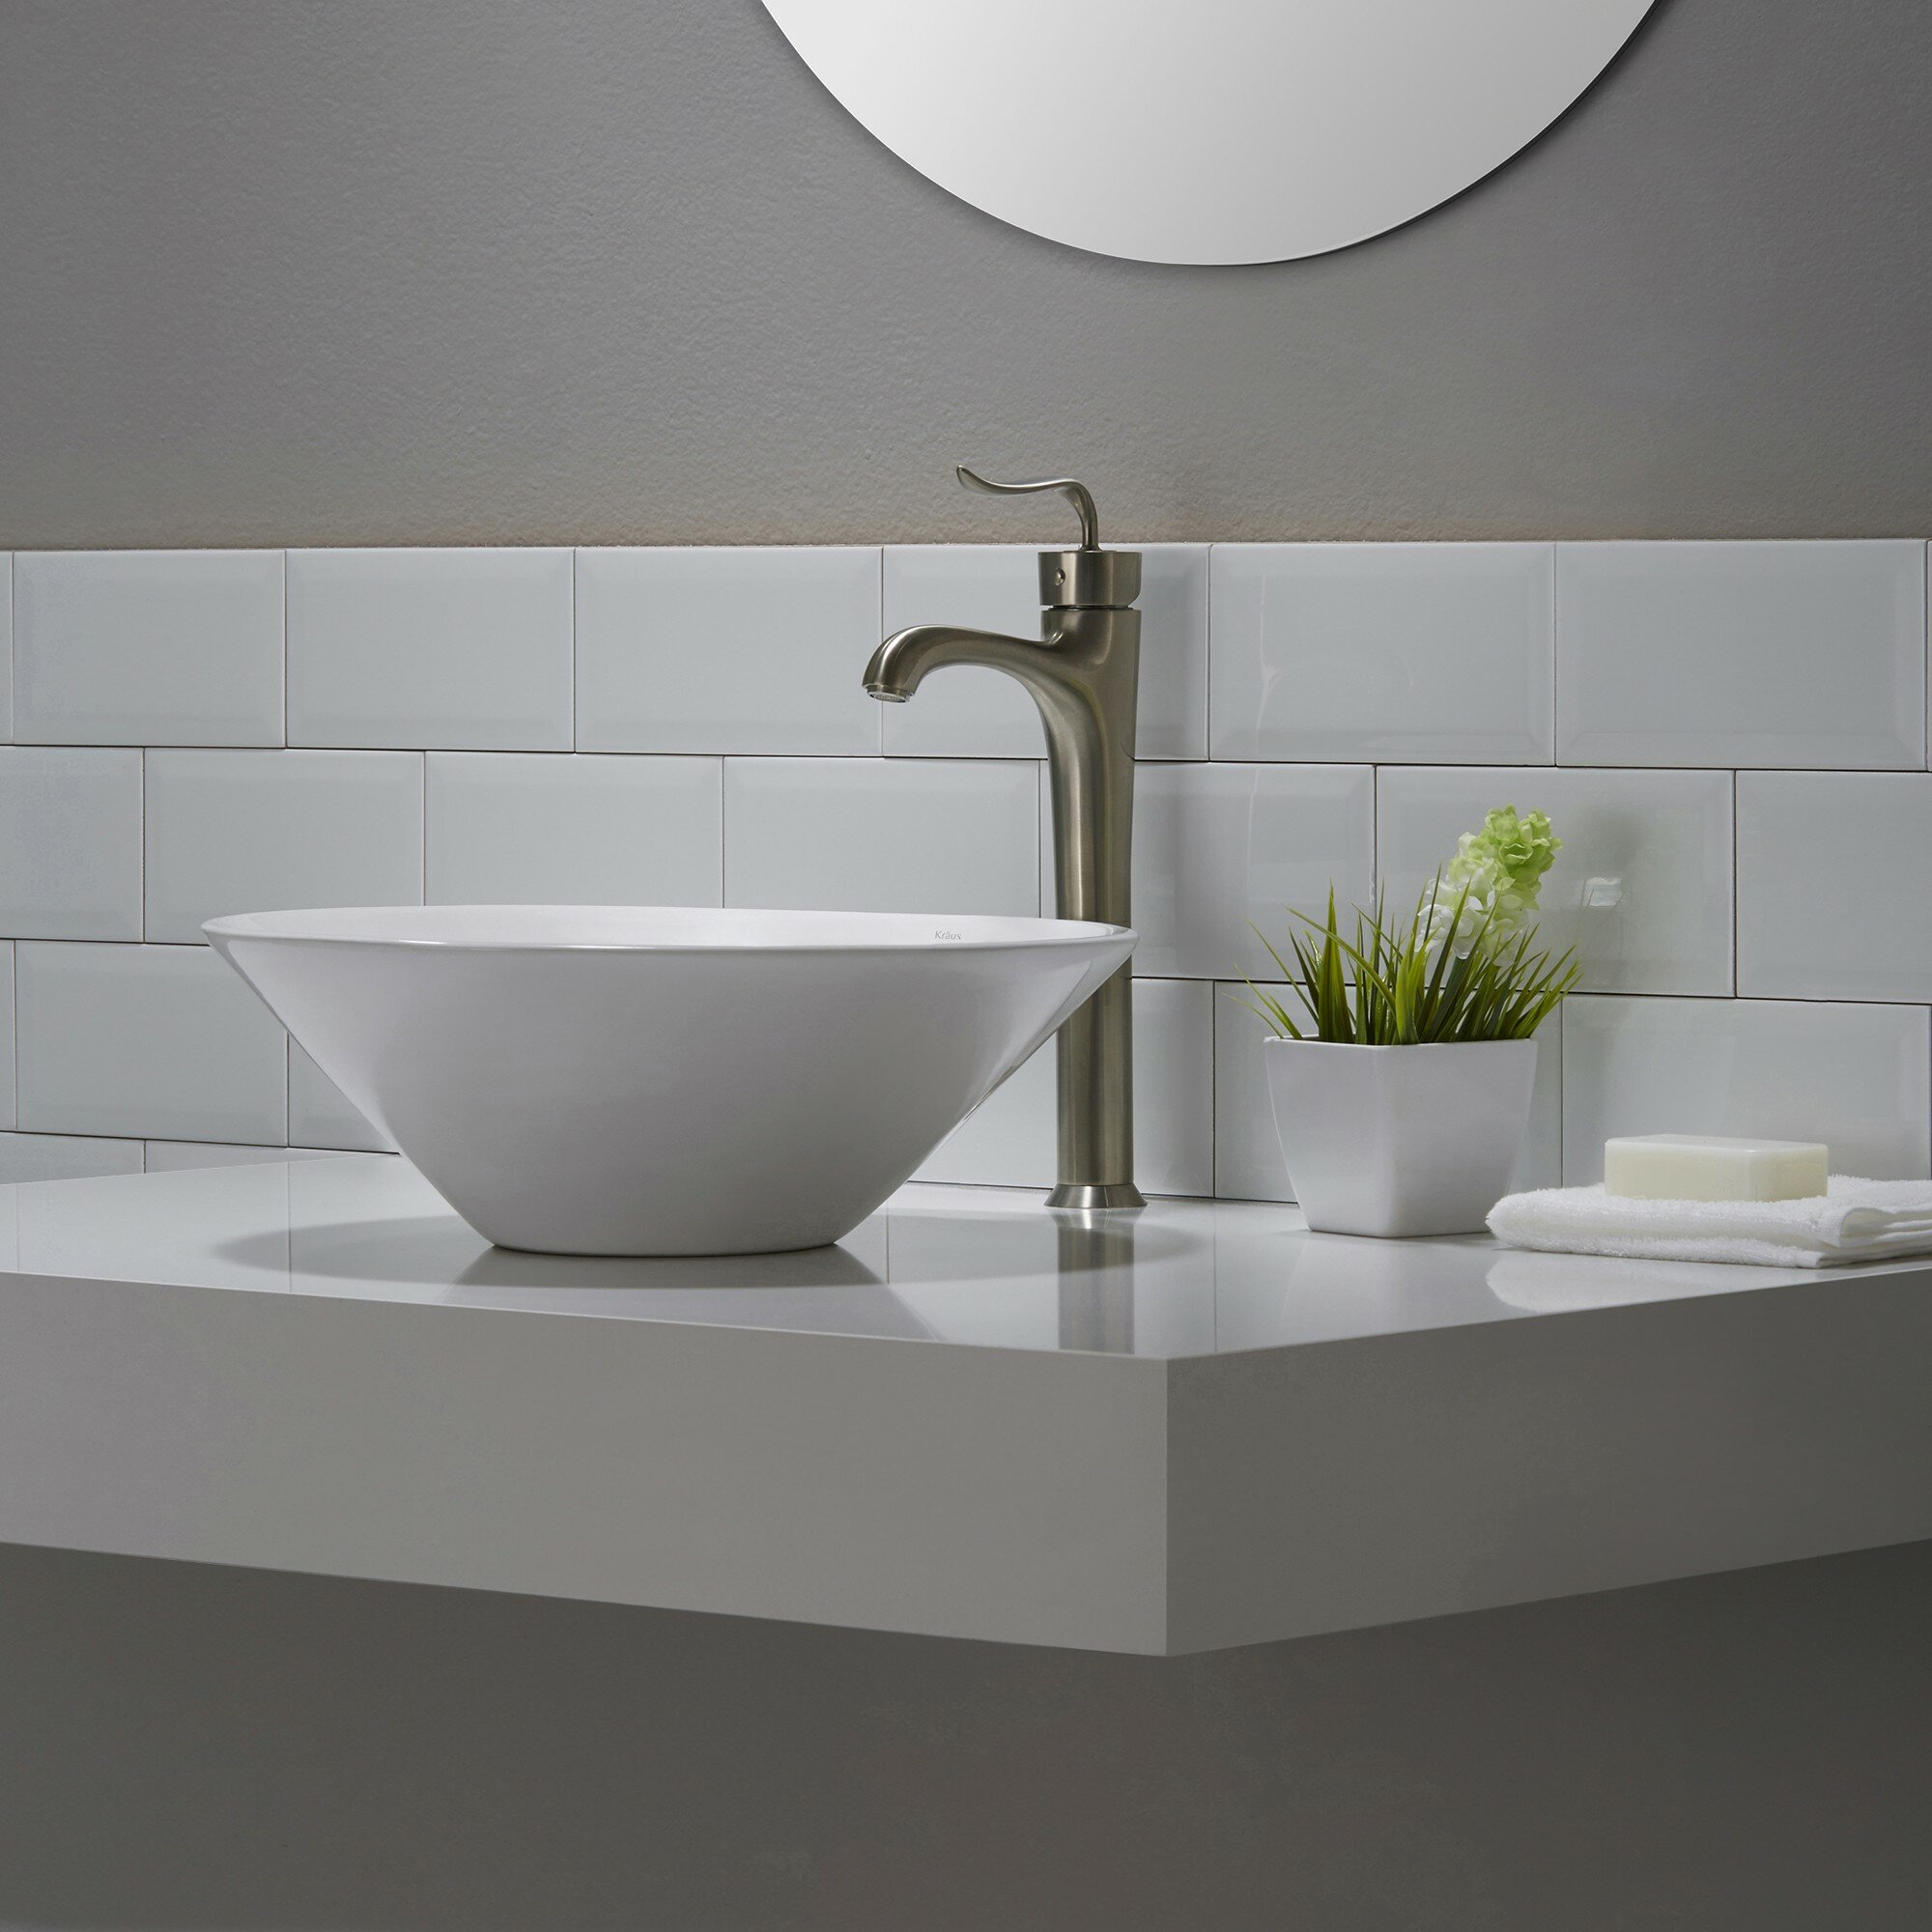 Round Bathroom Sinks: Kraus Elavo™ Ceramic Round Vessel Bathroom Sink & Reviews